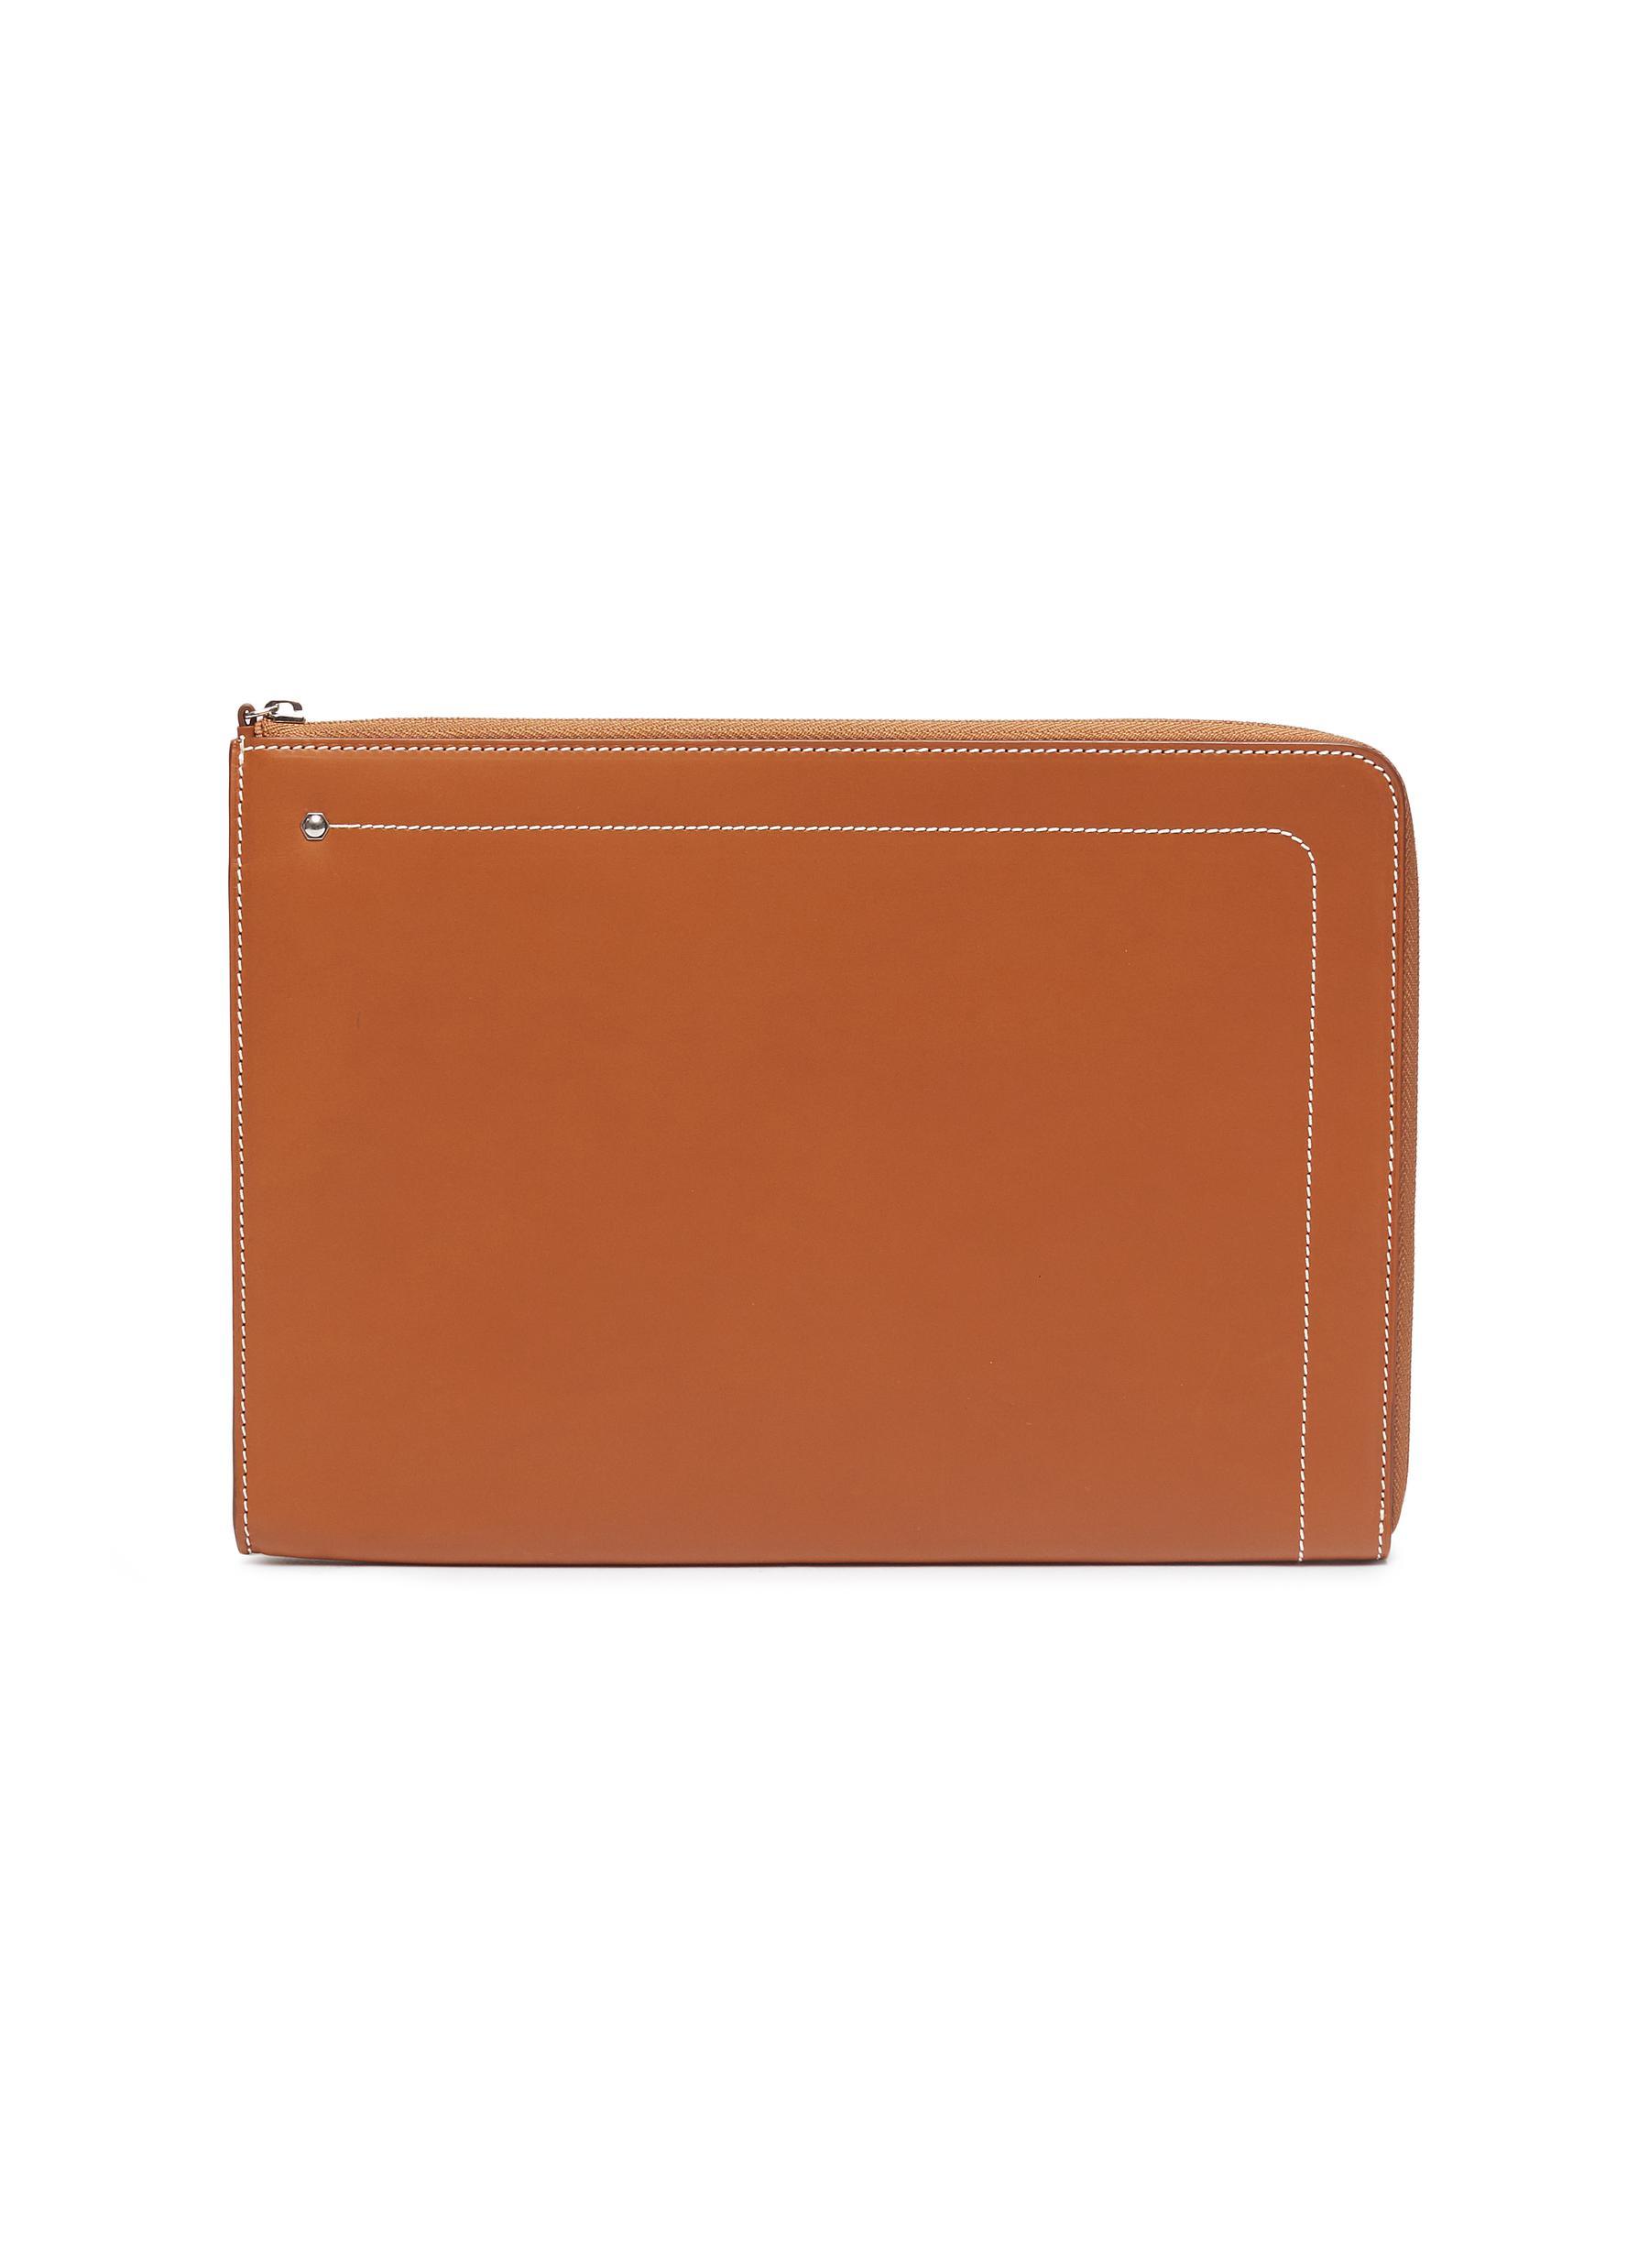 'Hex' leather tablet portfolio